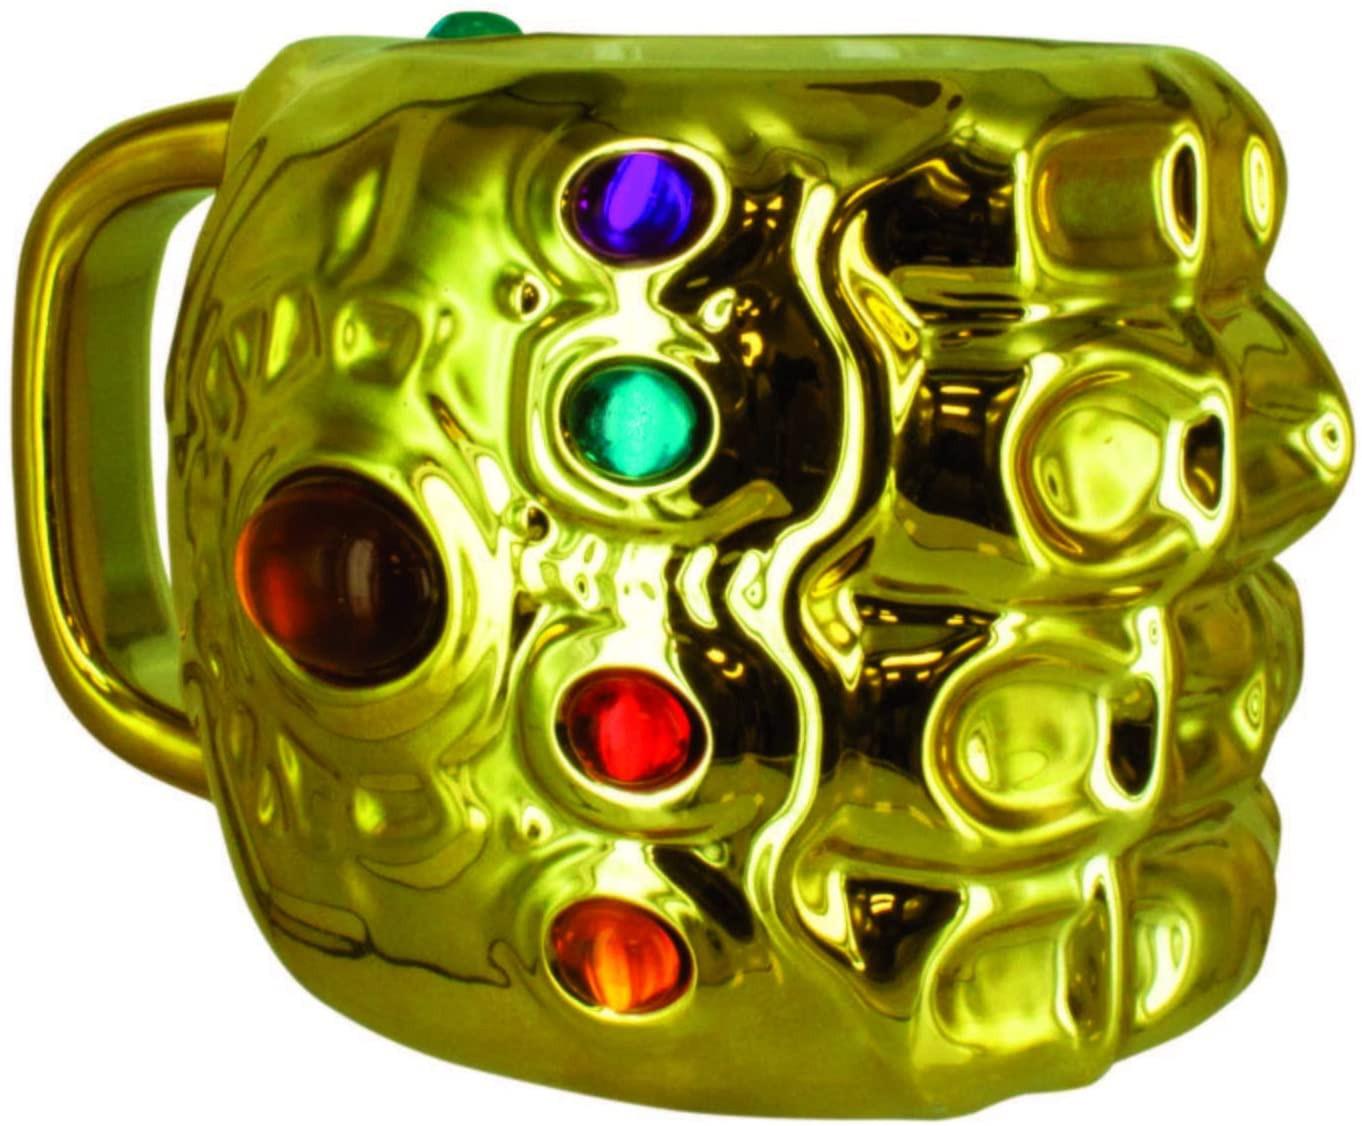 Marvel Infinity Gauntlet 3D puodukas